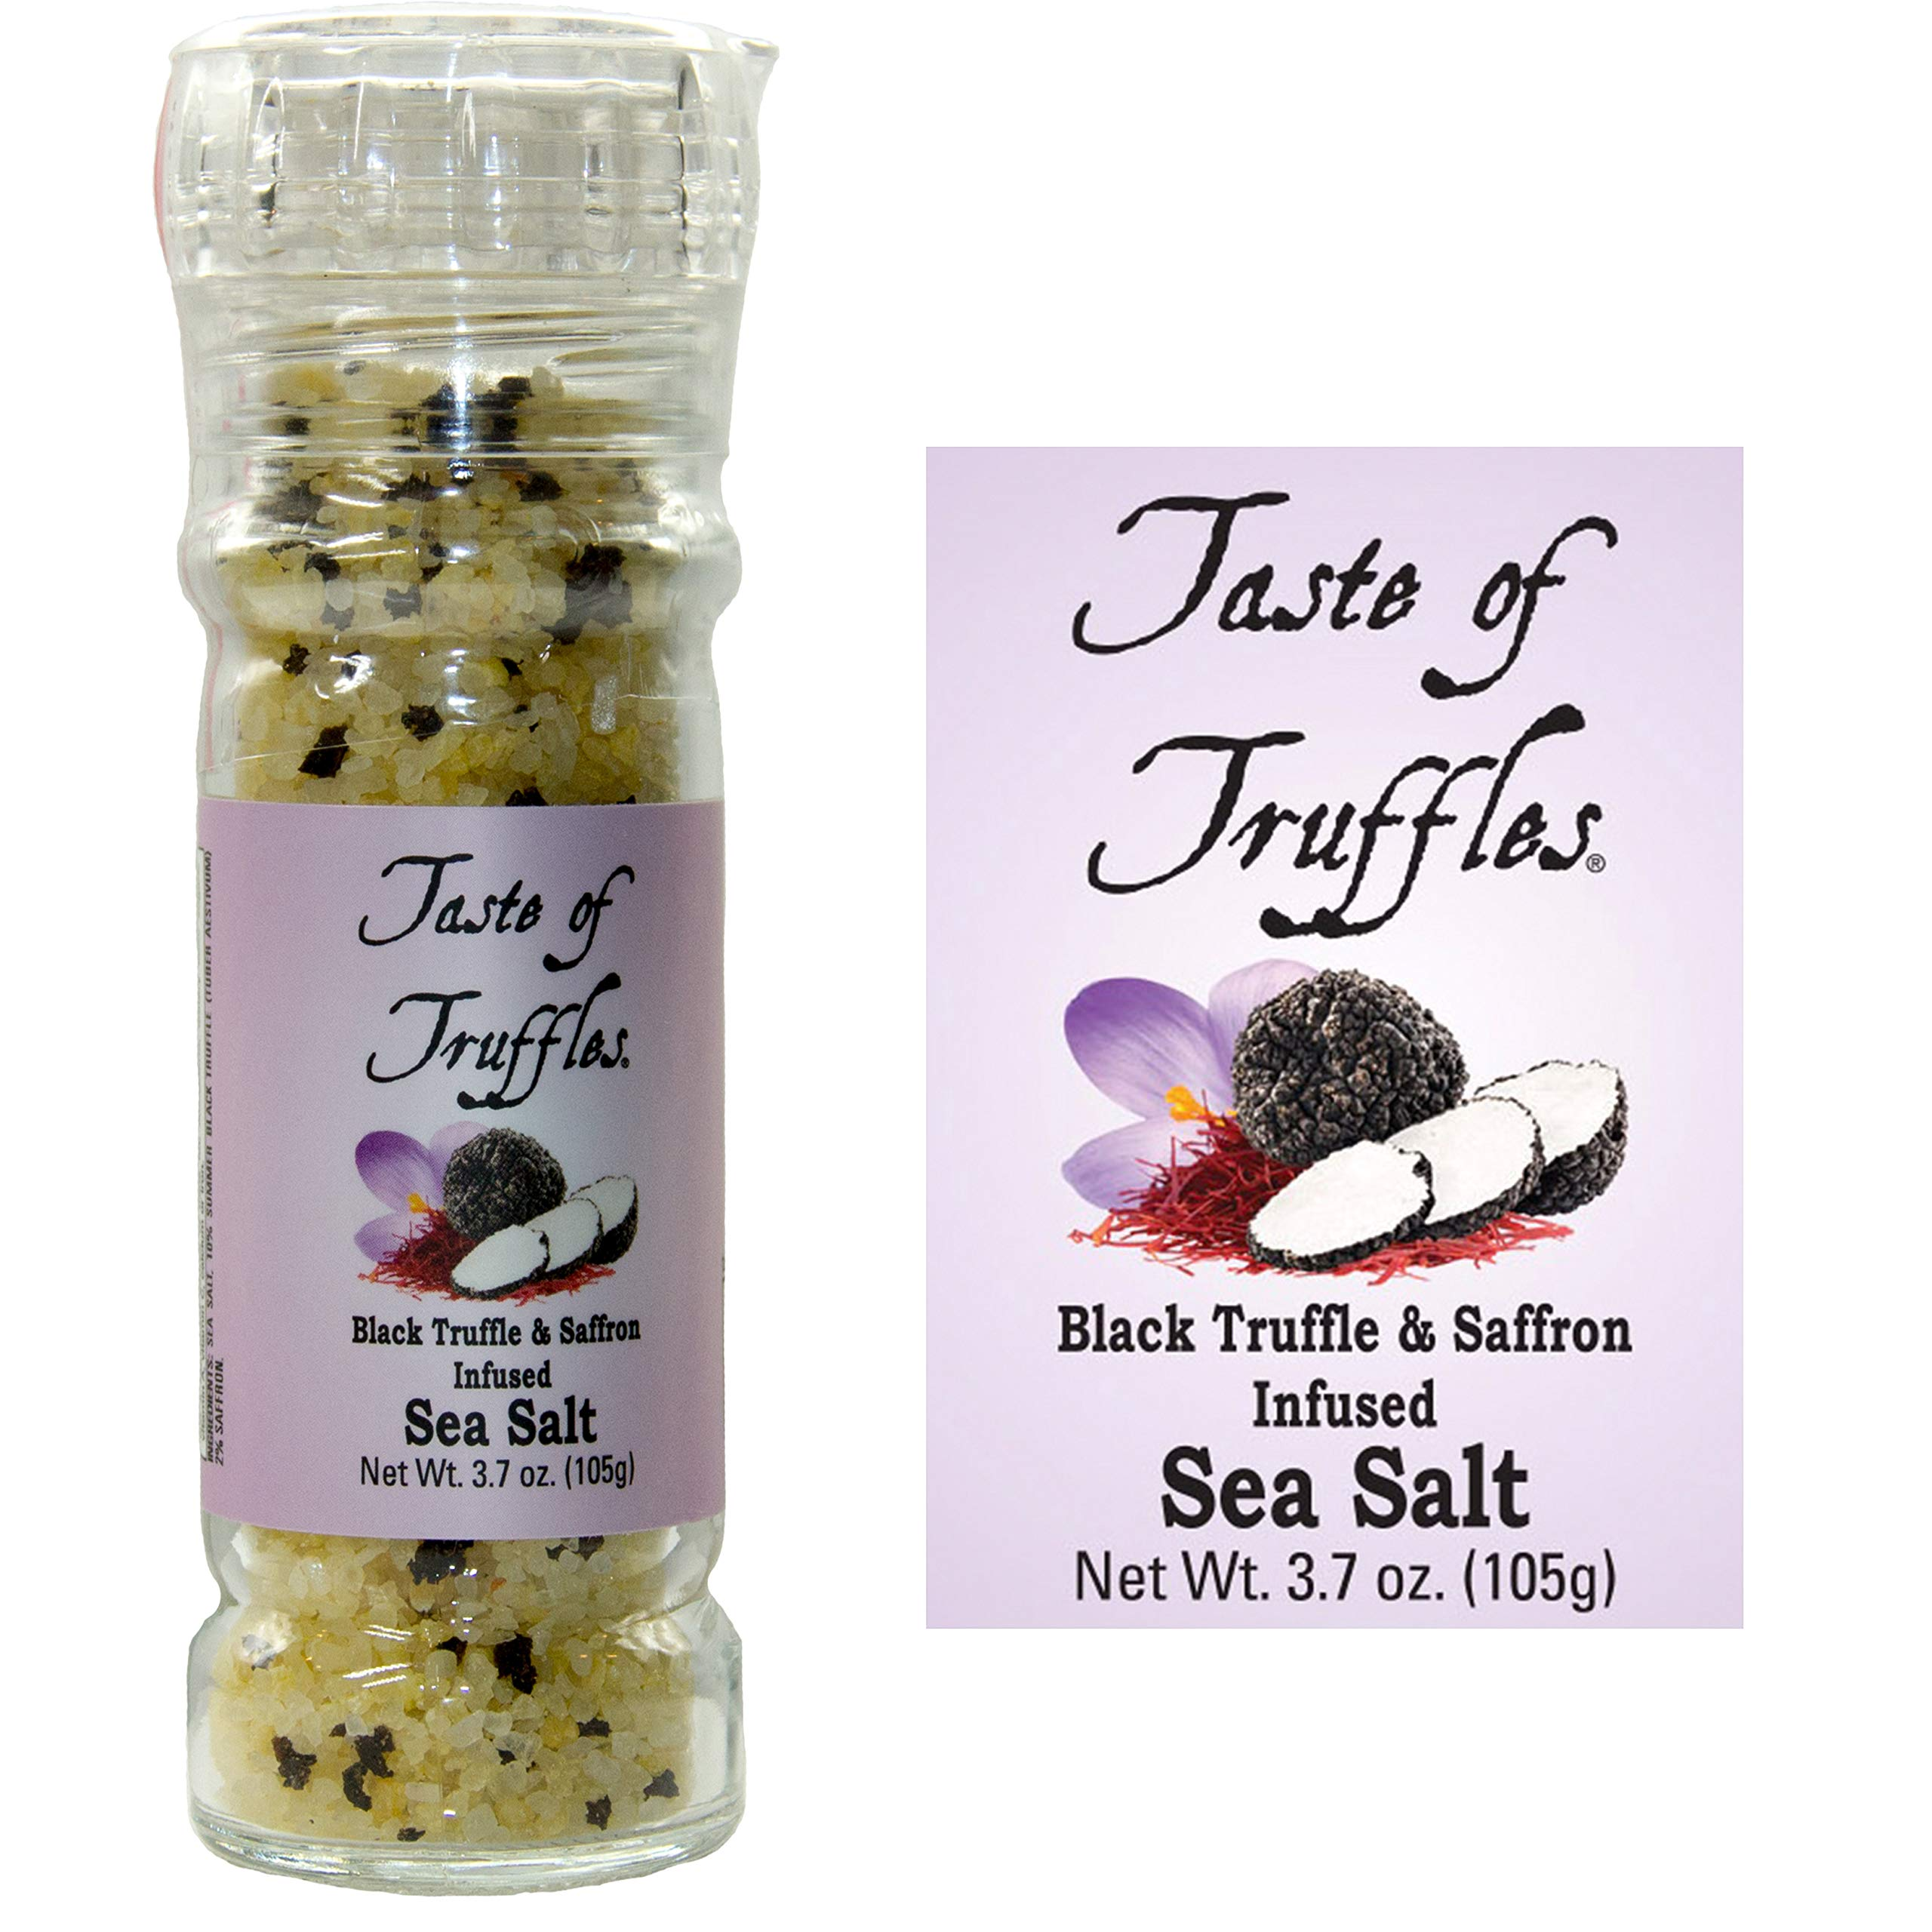 Black Truffle and Saffron Sea Salt | wt 3.7 oz | 105 gr